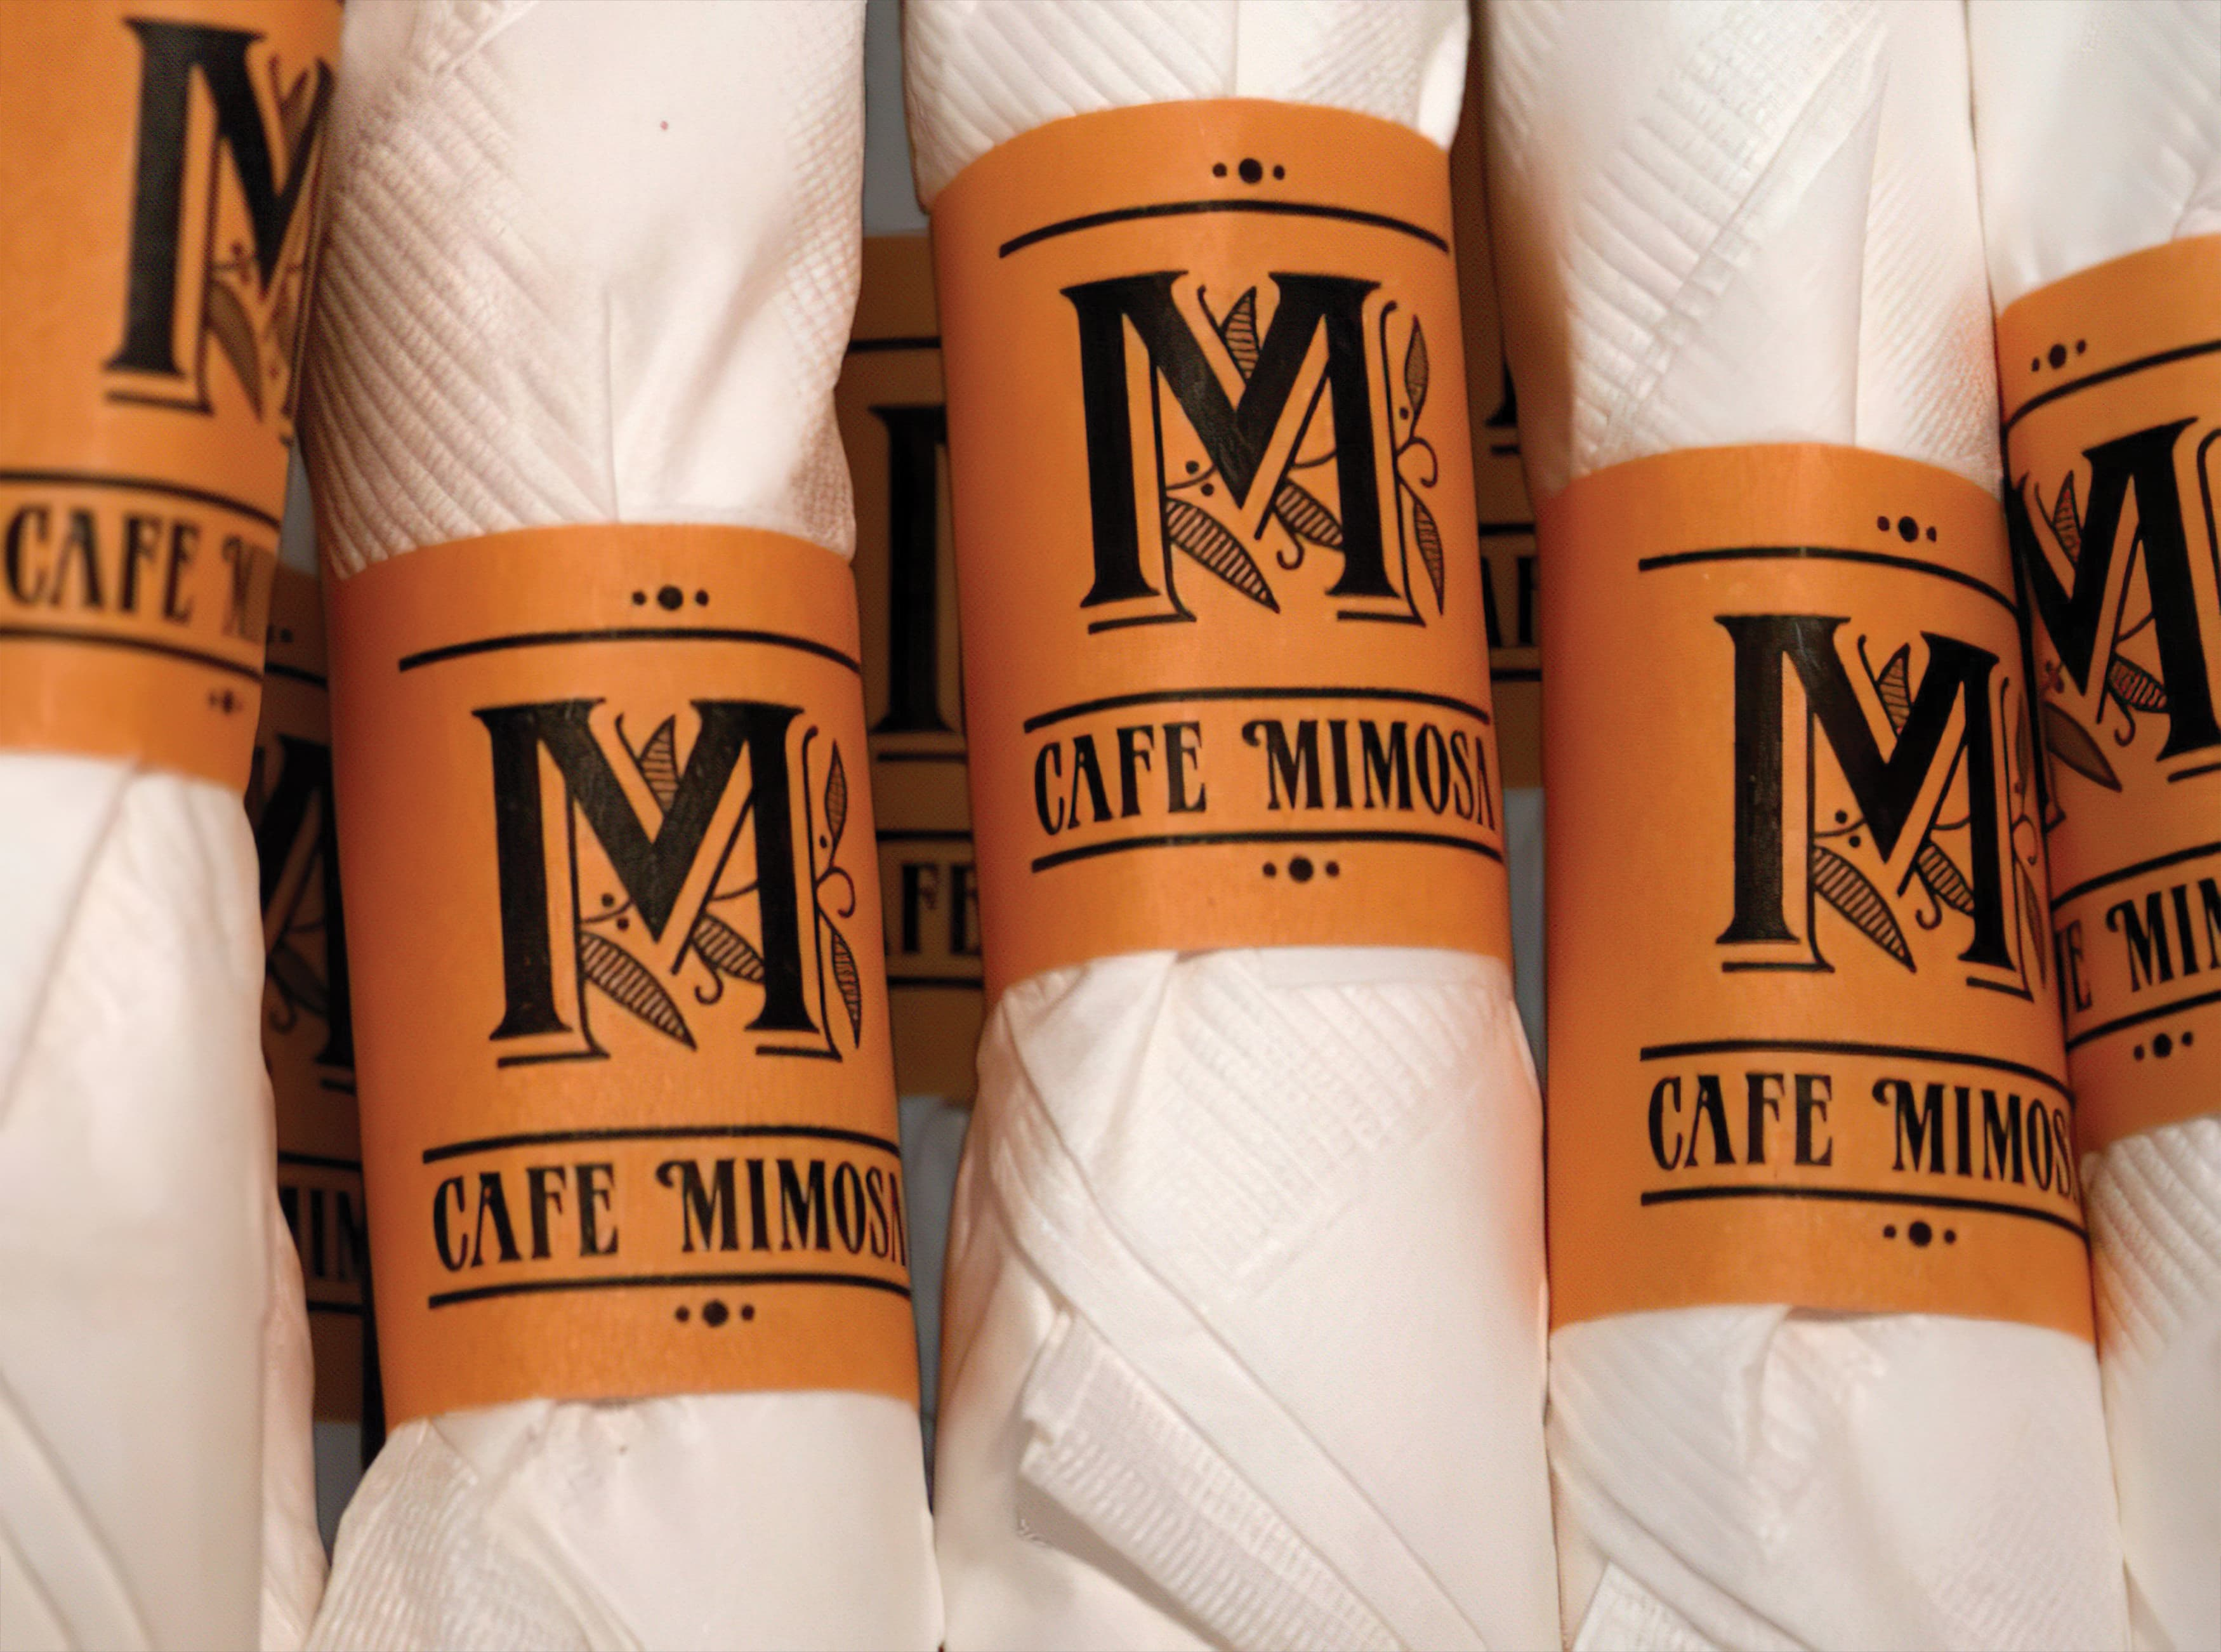 Cafe Mimosa, San Clemente. Restaurant Branding and Logo Design.